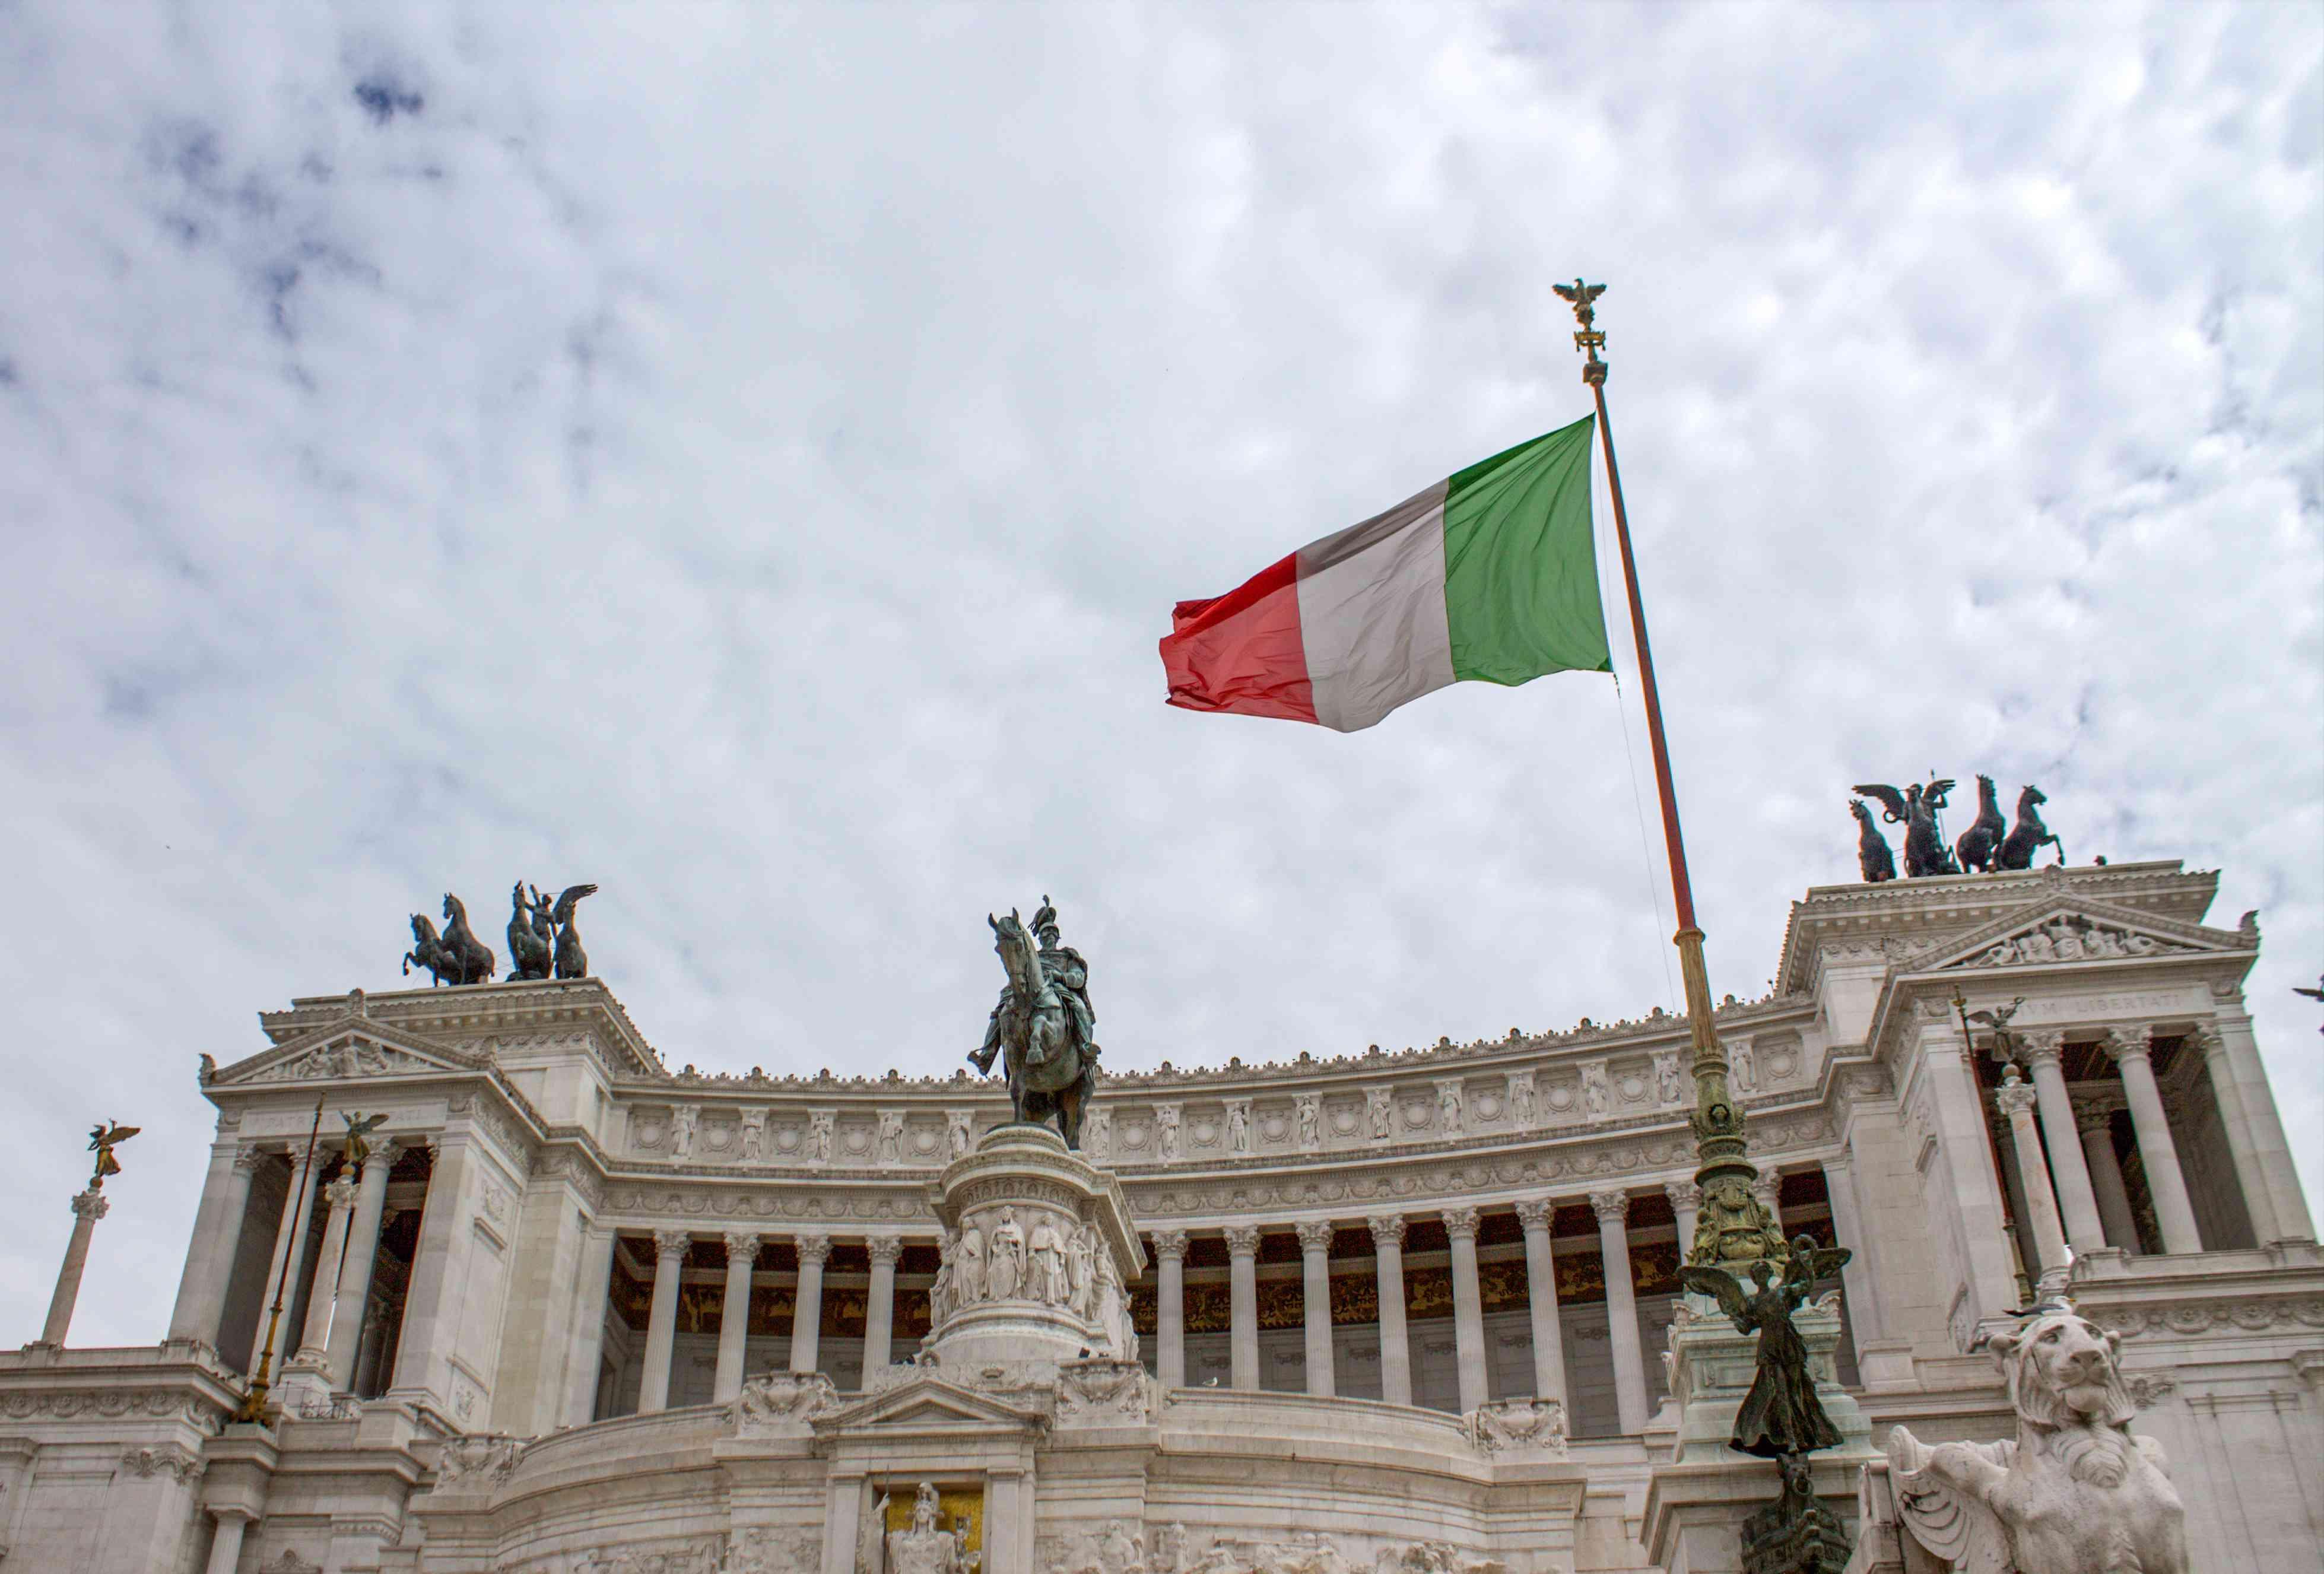 Capitolie Museums